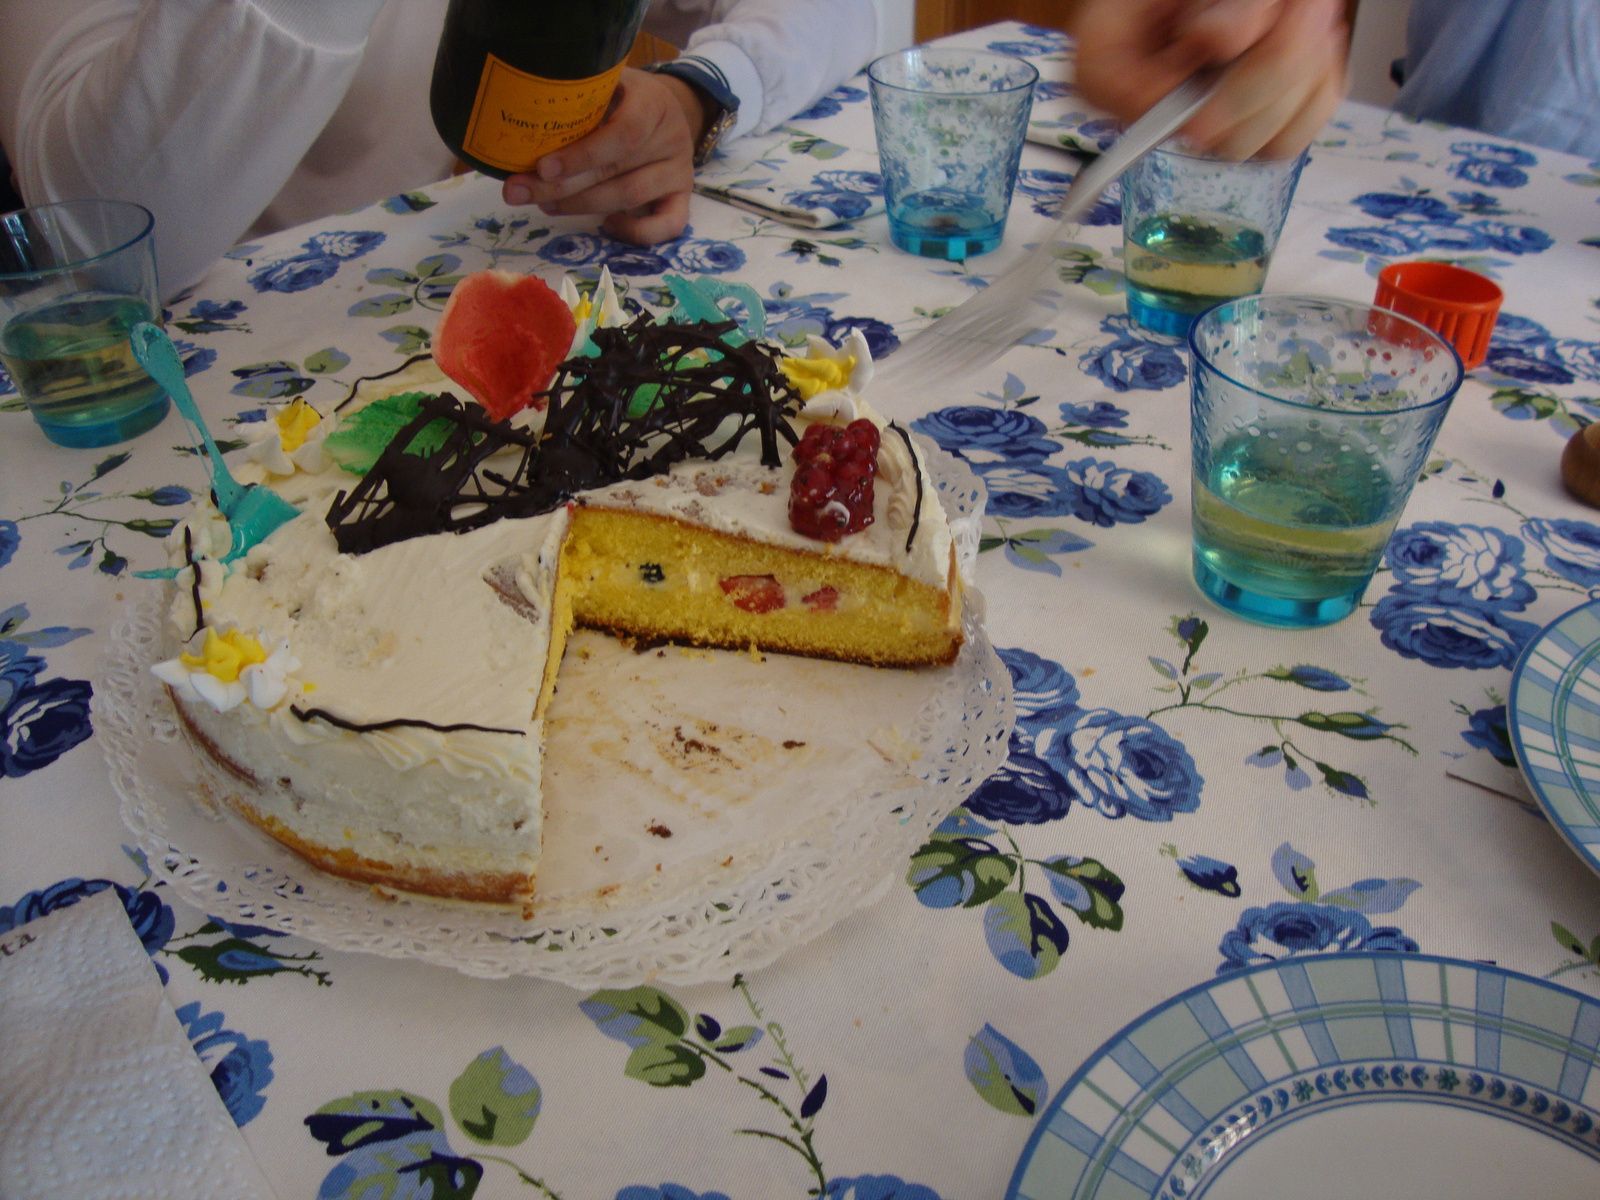 La scienza in cucina torte di compleanno - La cucina di sara torte ...